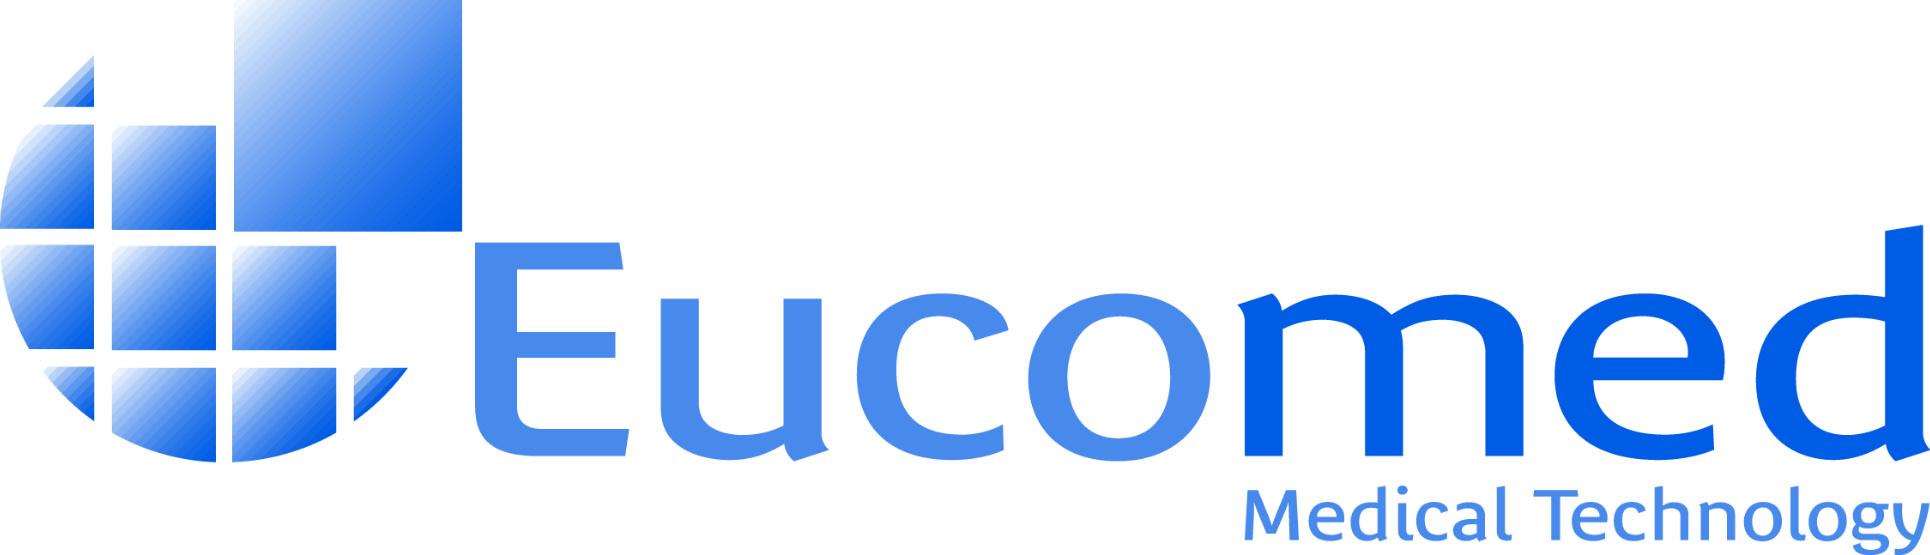 logo for EUCOMEDC